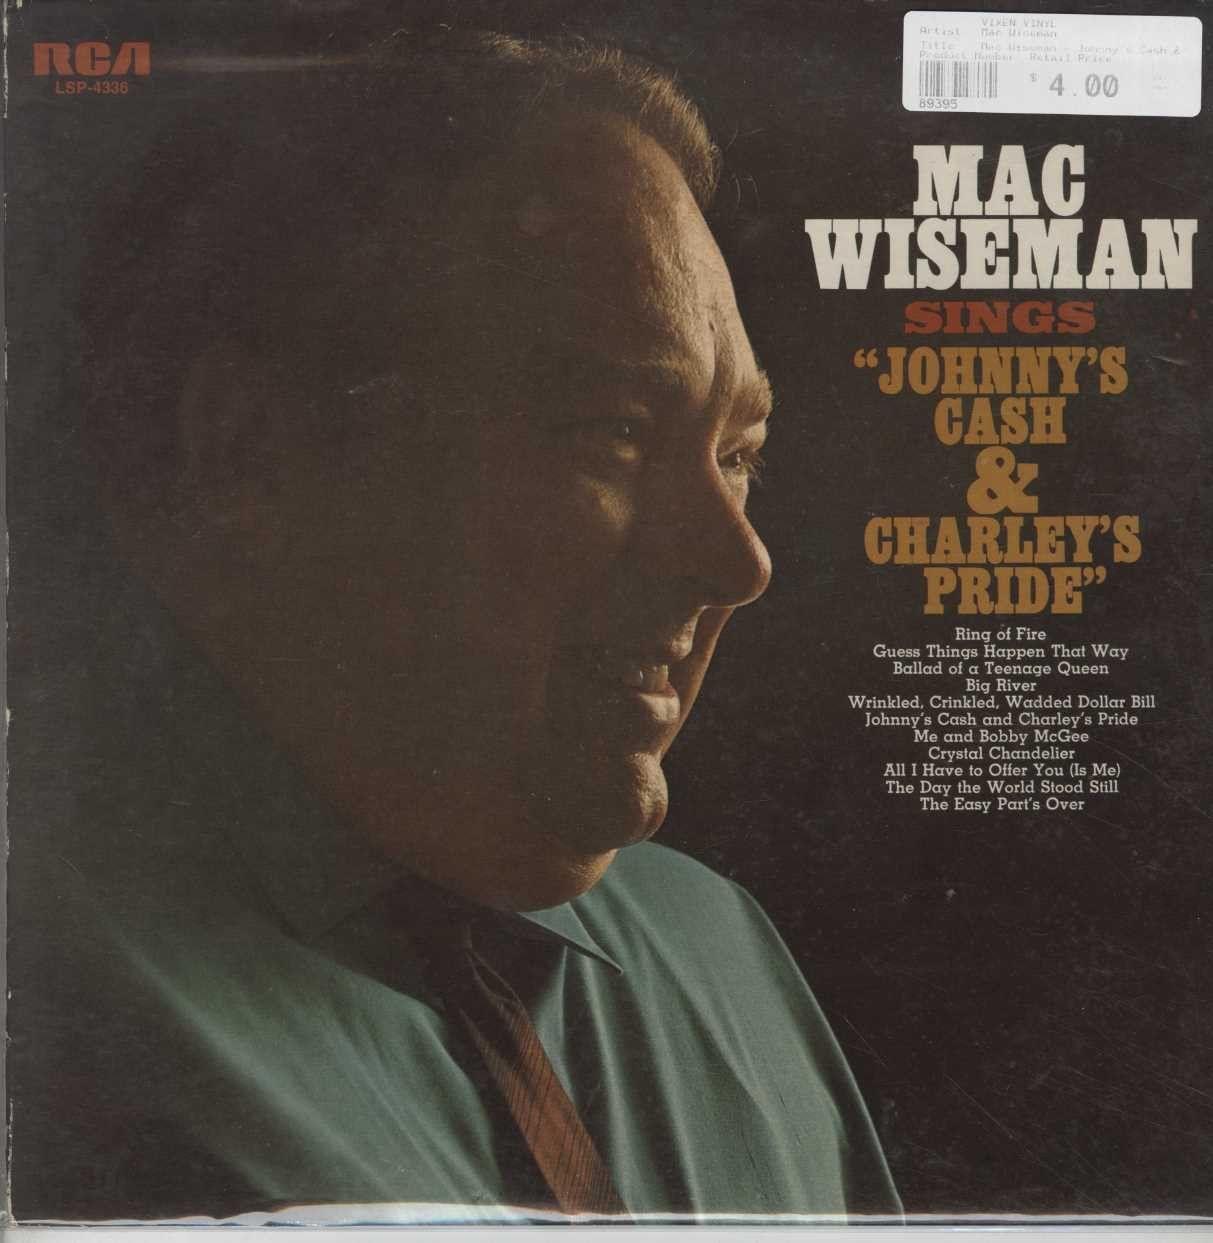 Mac Wiseman - Johnny\'s Cash & Charley\'s Pride | Charley pride ...